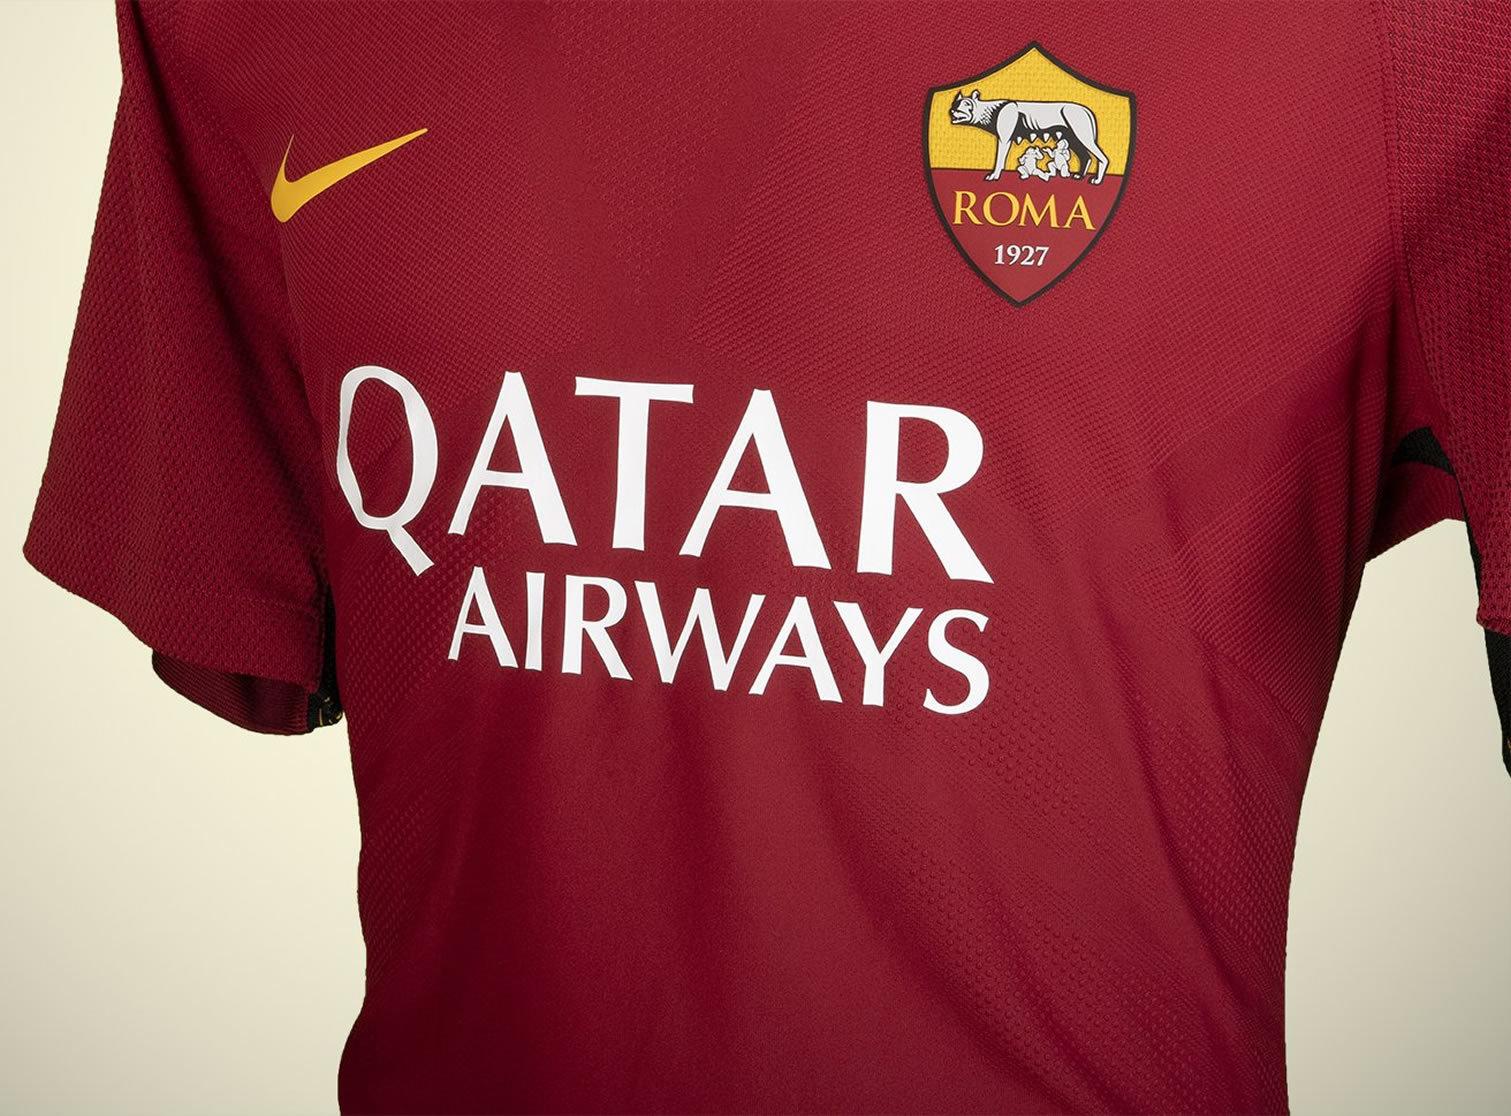 Qatar Airways nuevo sponsor de la AS Roma